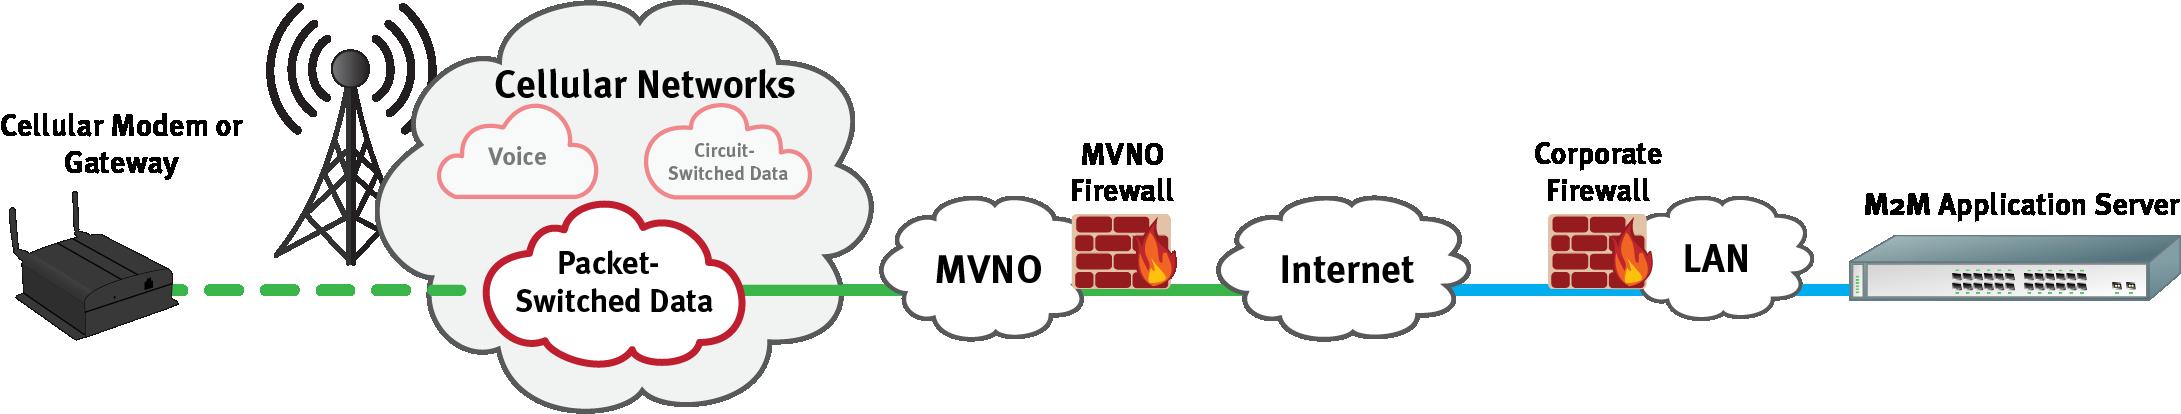 Cellular Data Client Server Diagram